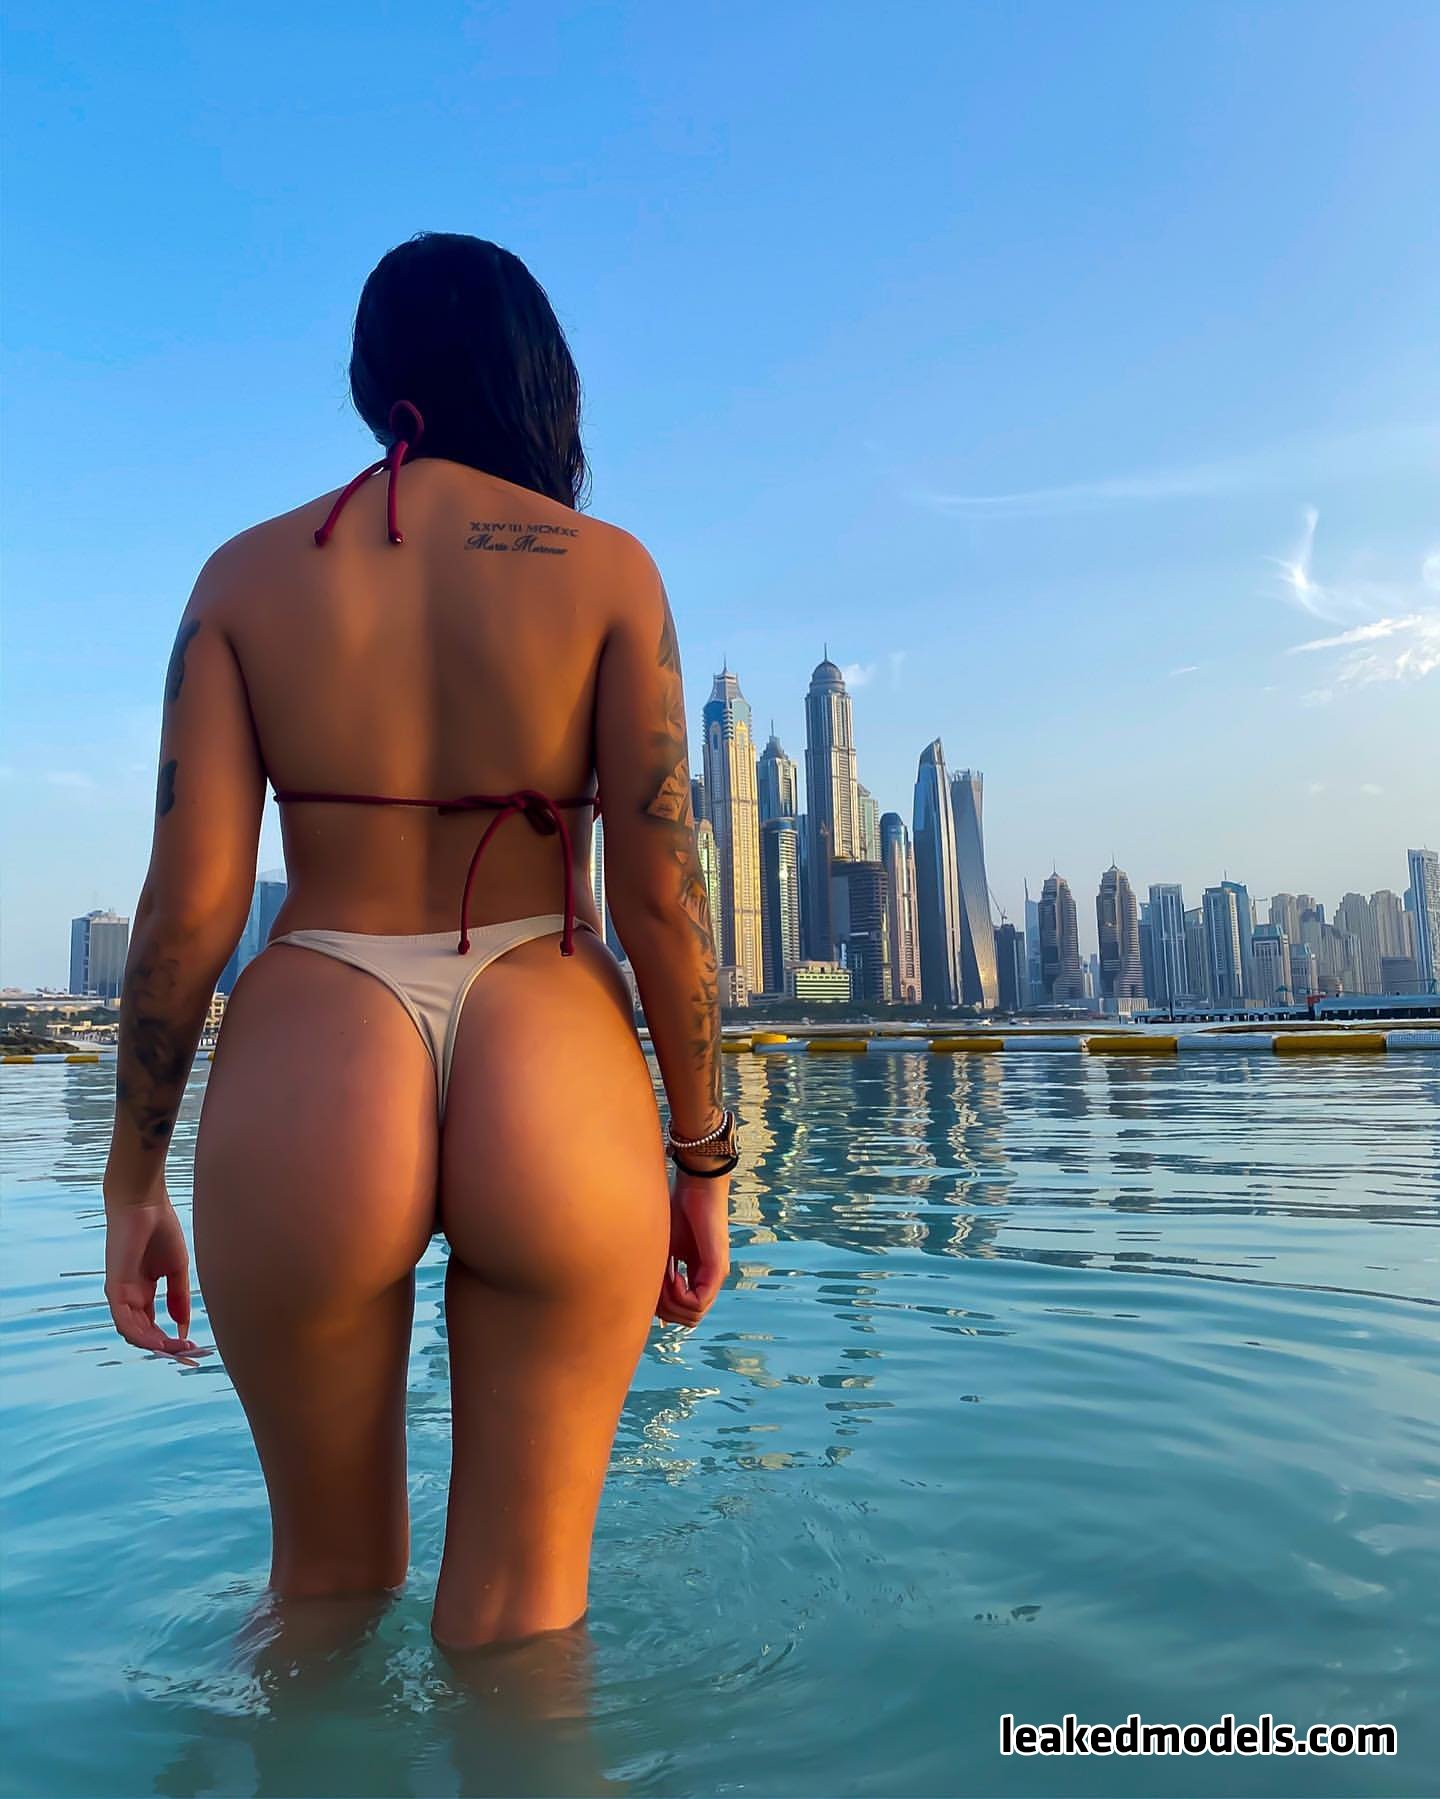 ImmaMaren OnlyFans Nude Leaks (30 Photos)